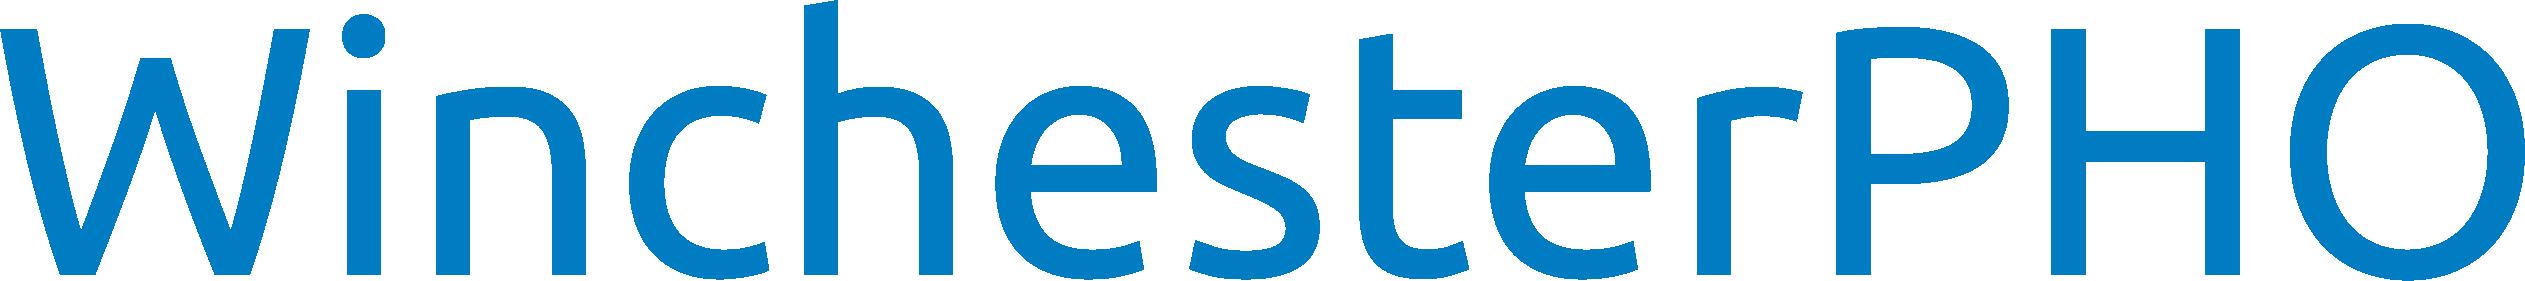 Winchester PHO logo